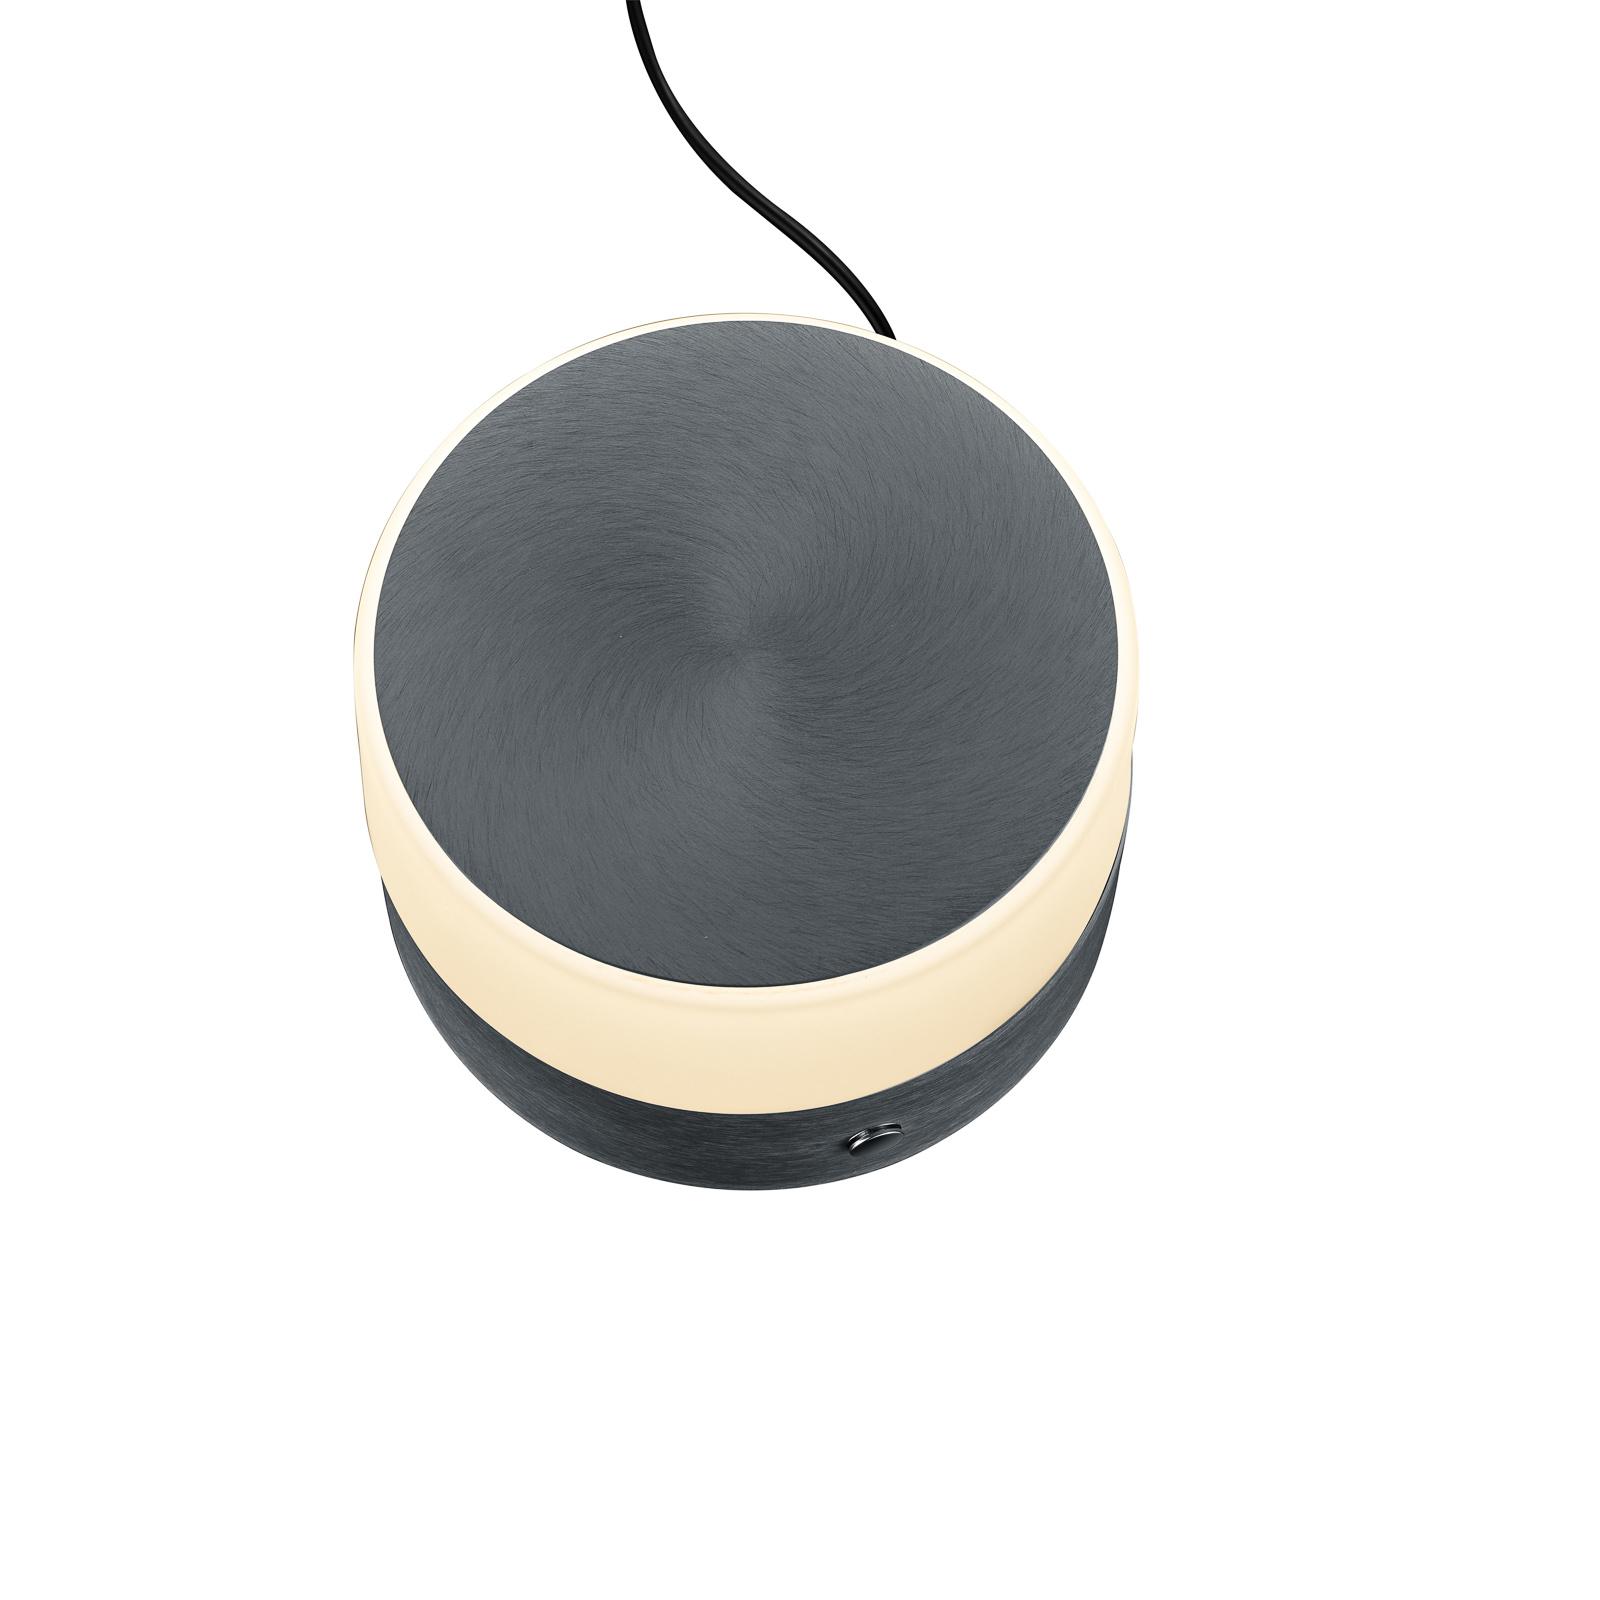 BANKAMP Button LED-Tischlampe Höhe 11cm anthrazit